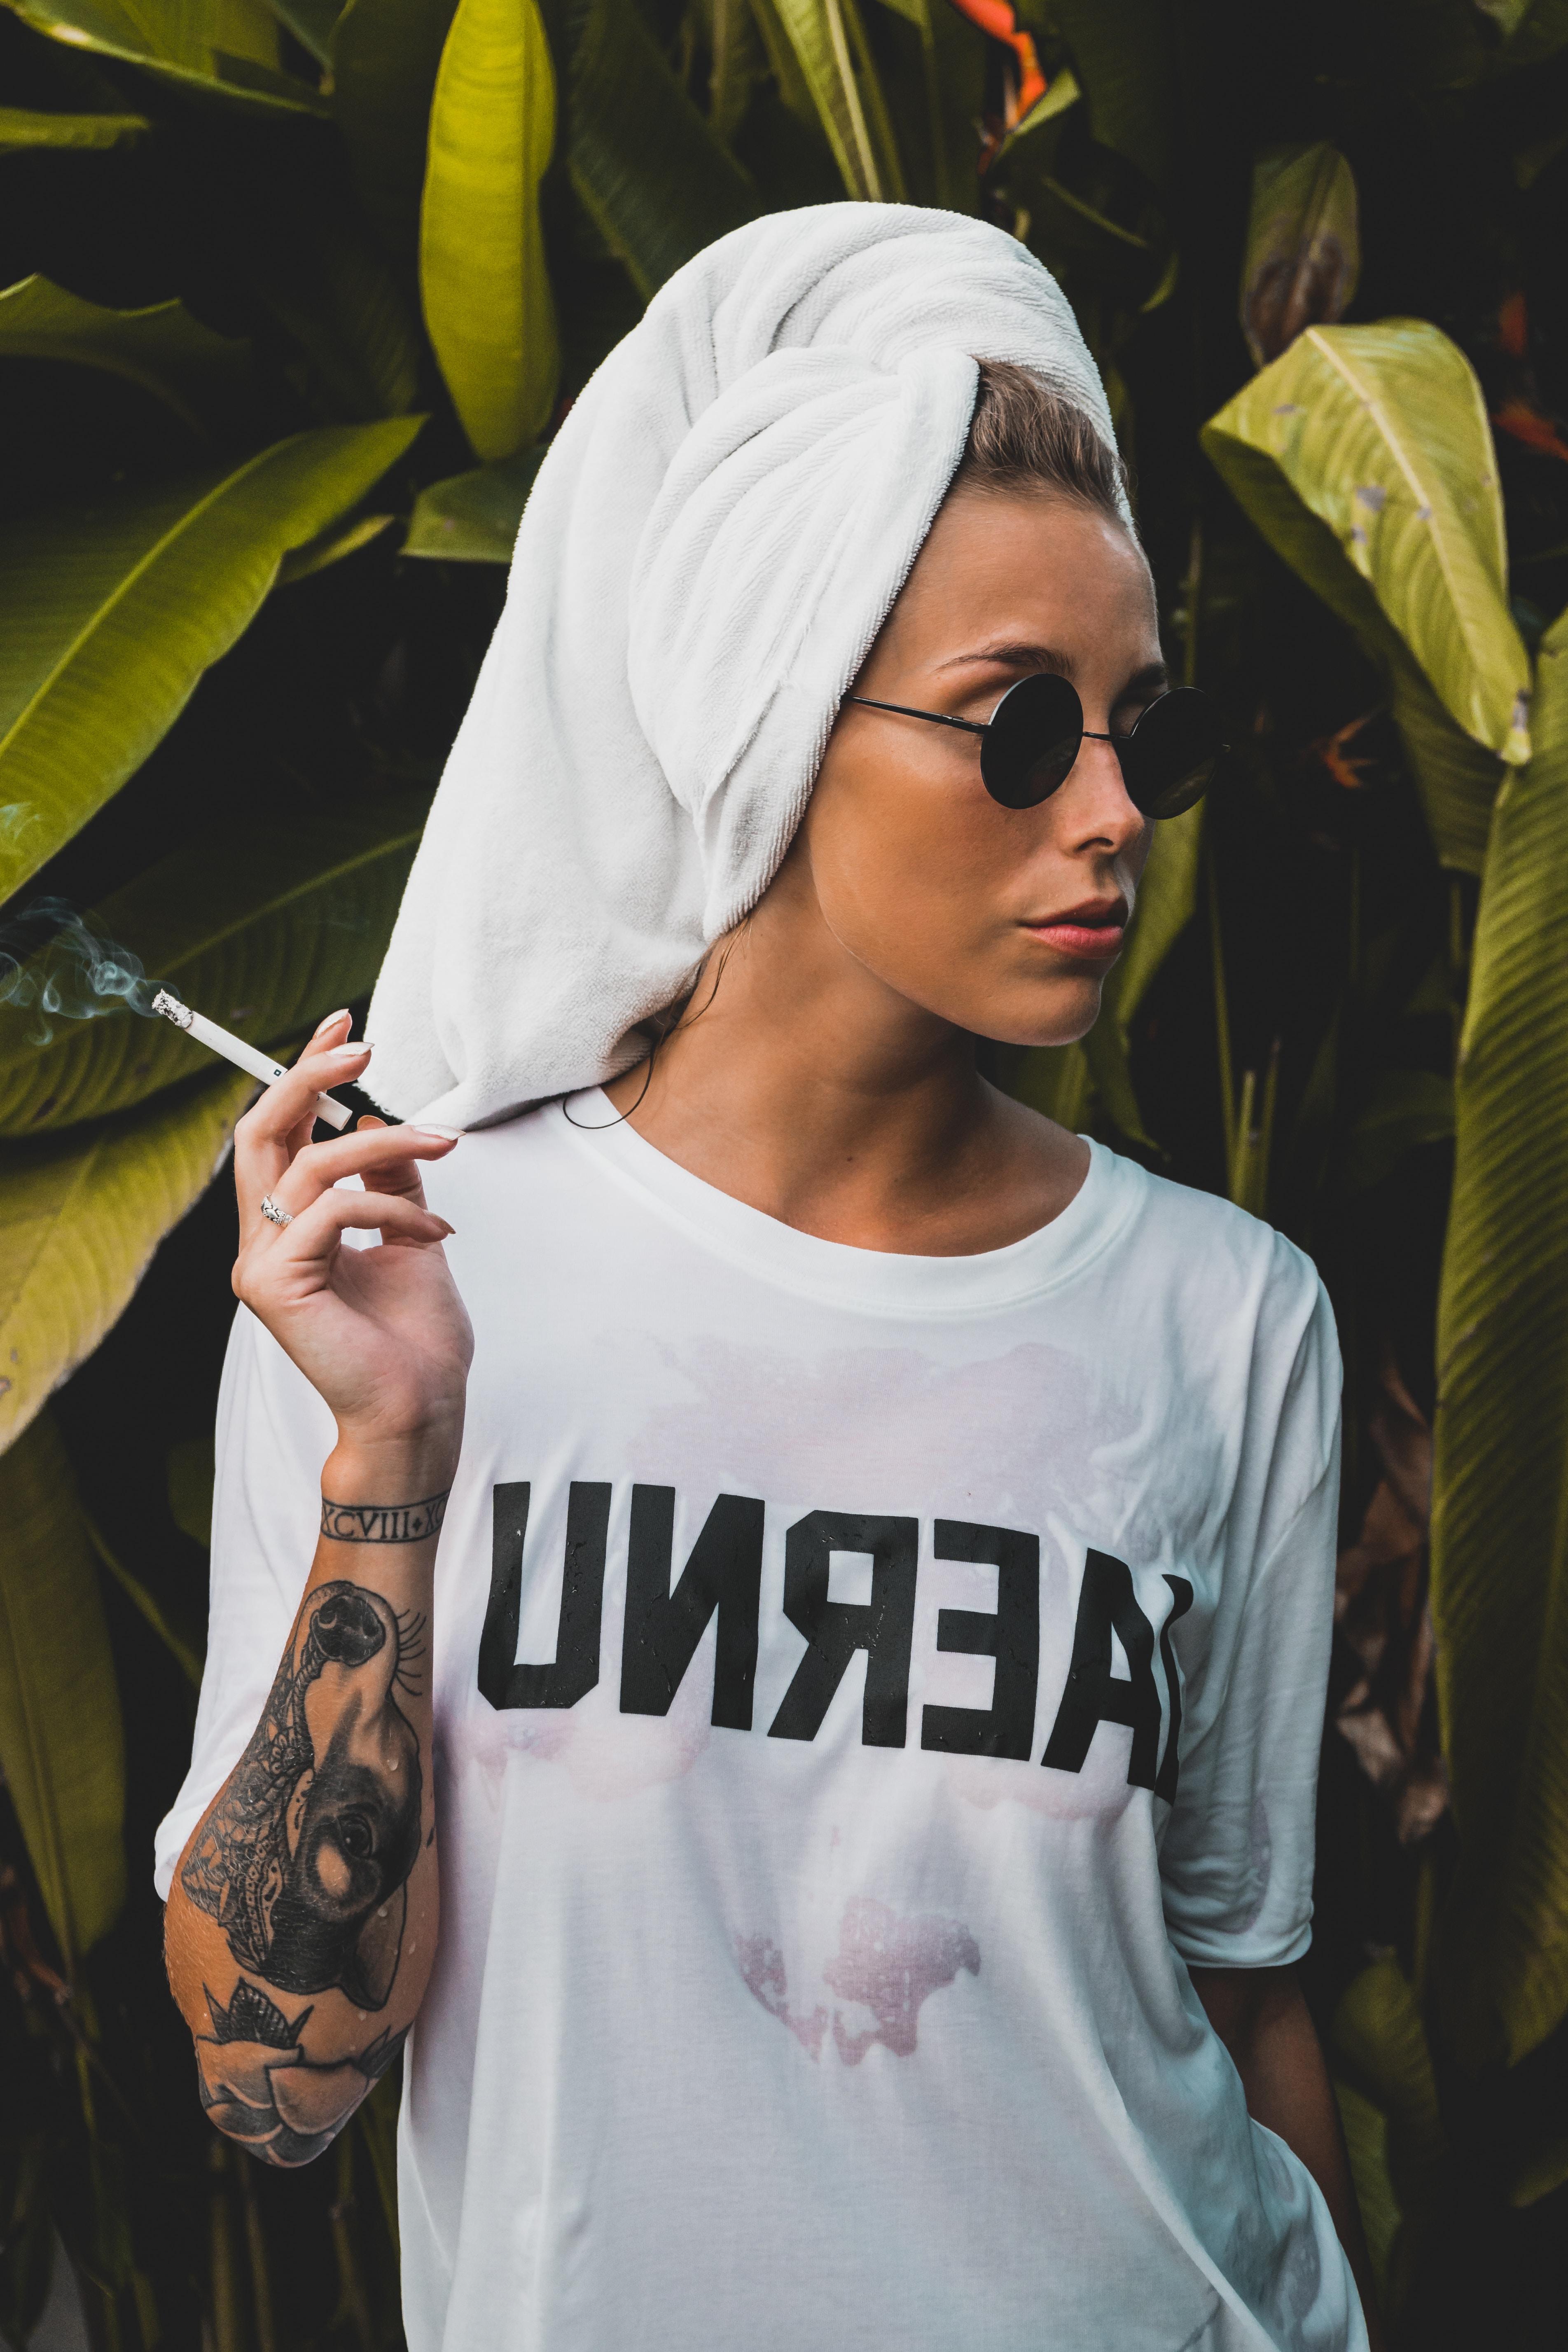 woman holding cigarette stick